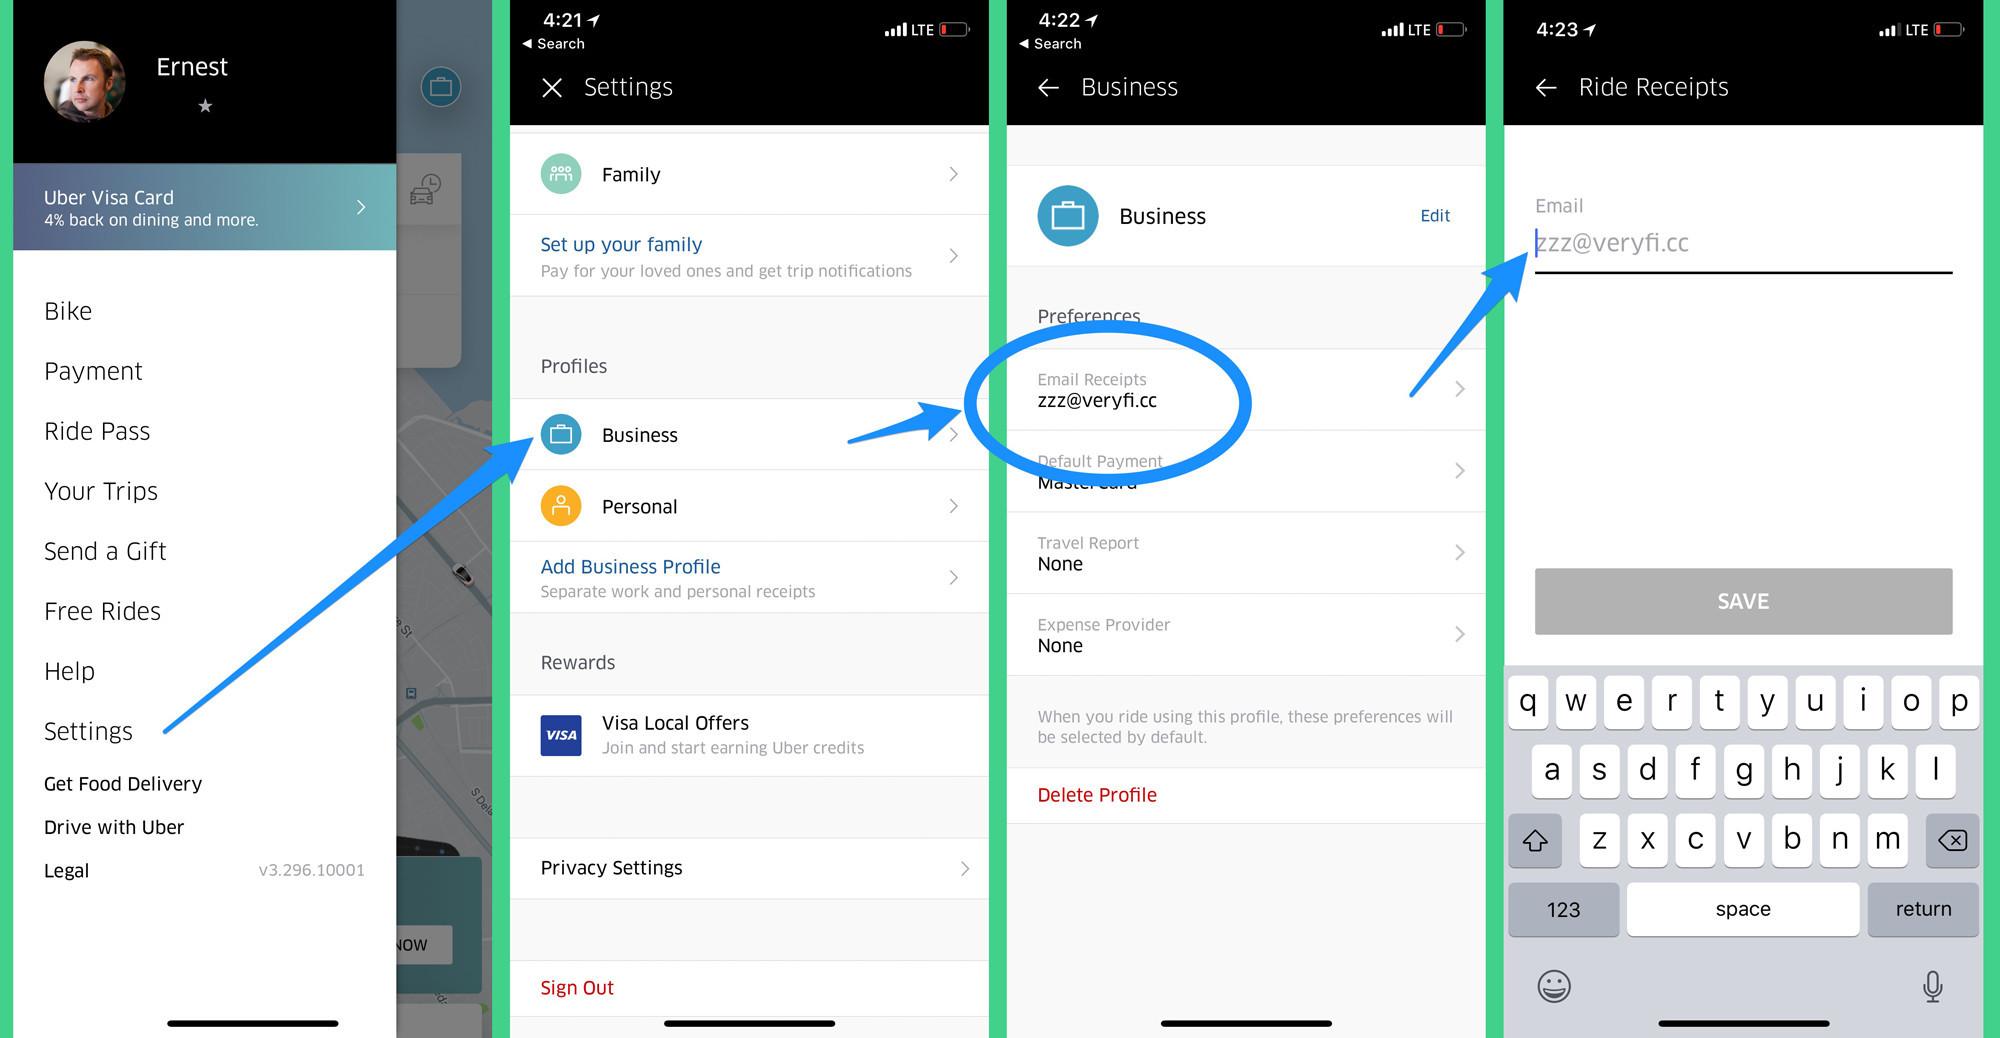 Send Uber Receipts to Veryfi